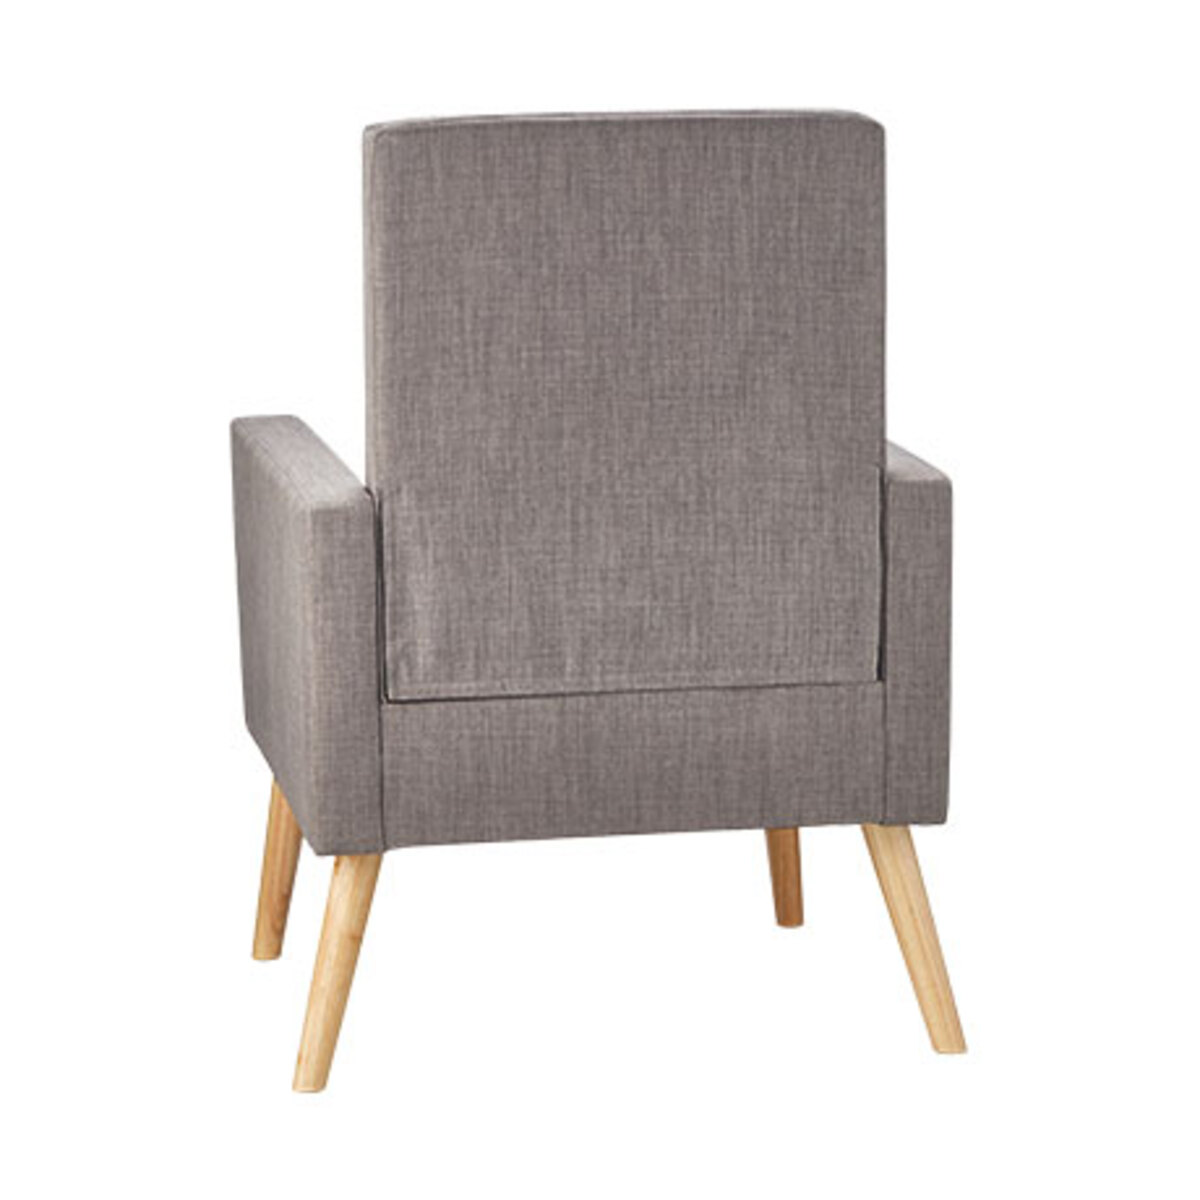 Bild 5 von 2-in-1 Schaukelstuhl-Sessel inkl. Zierkissen1